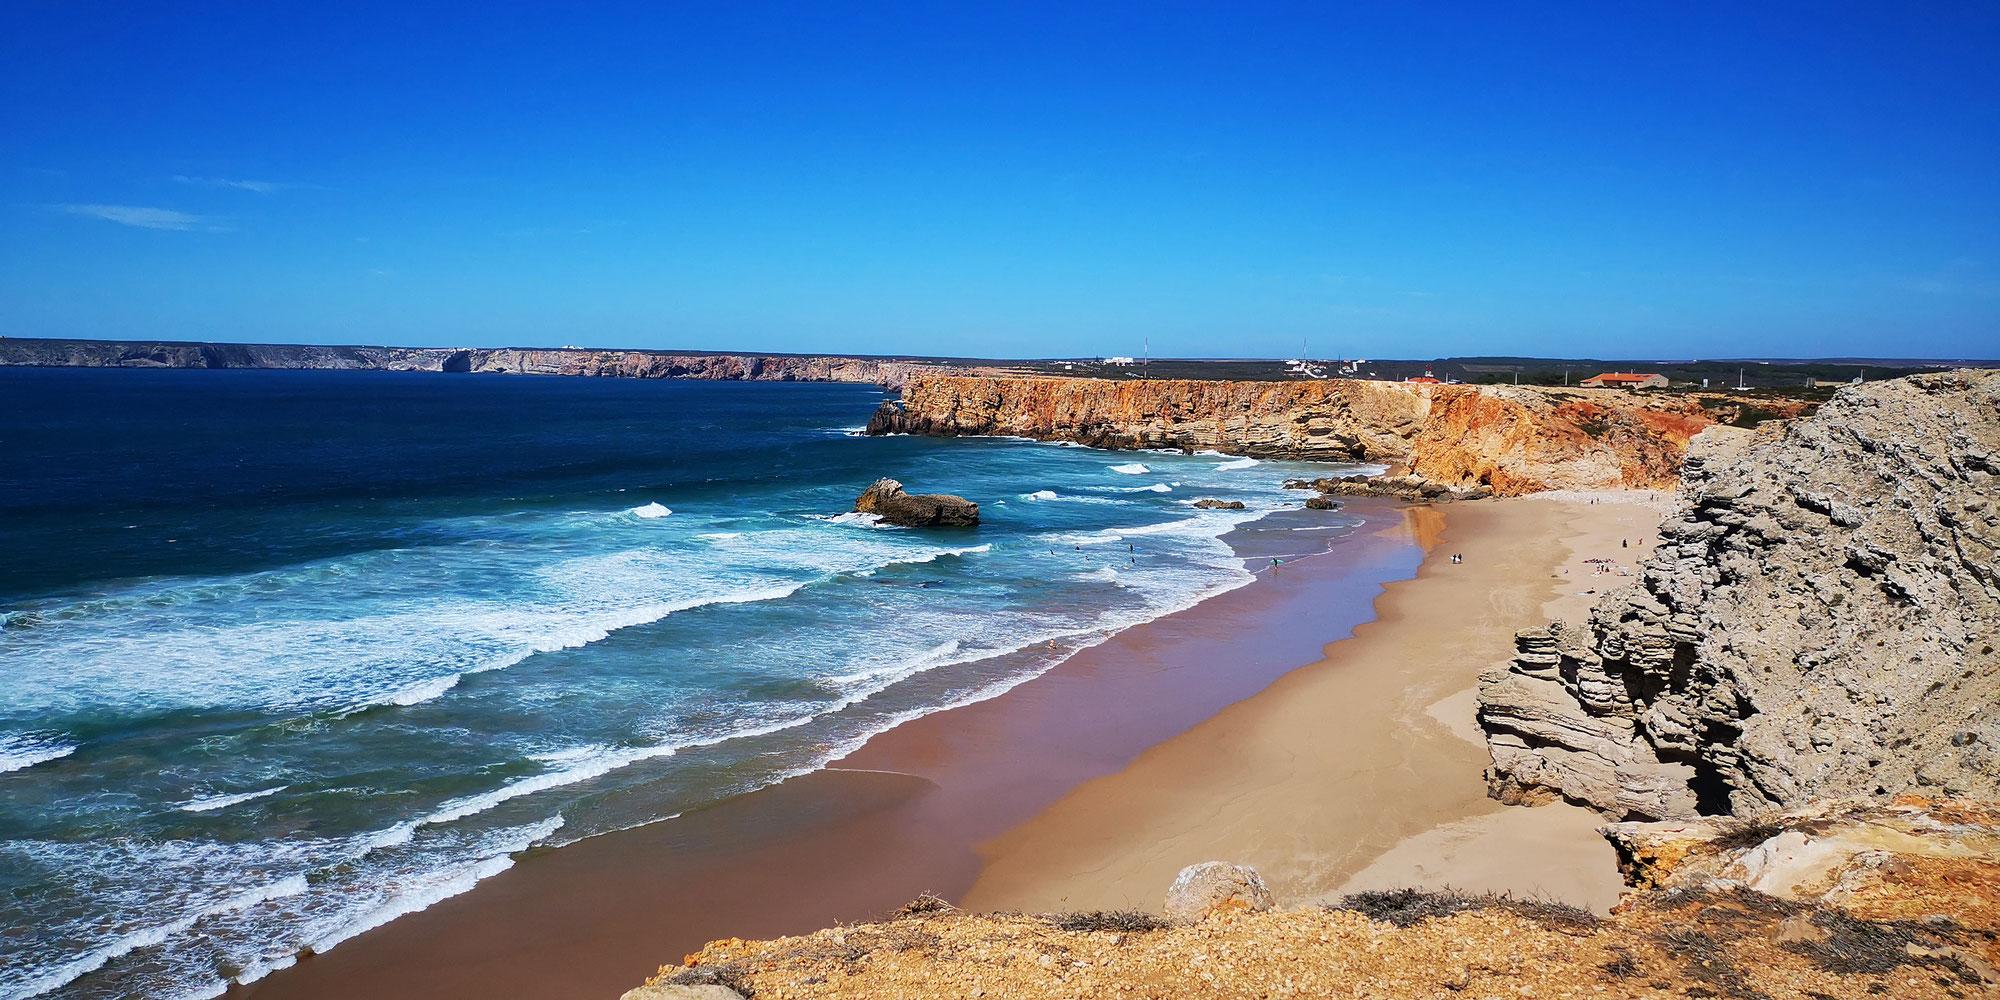 Reiseziel Algarve Teil III – Küstenabschnitte an der Algarve